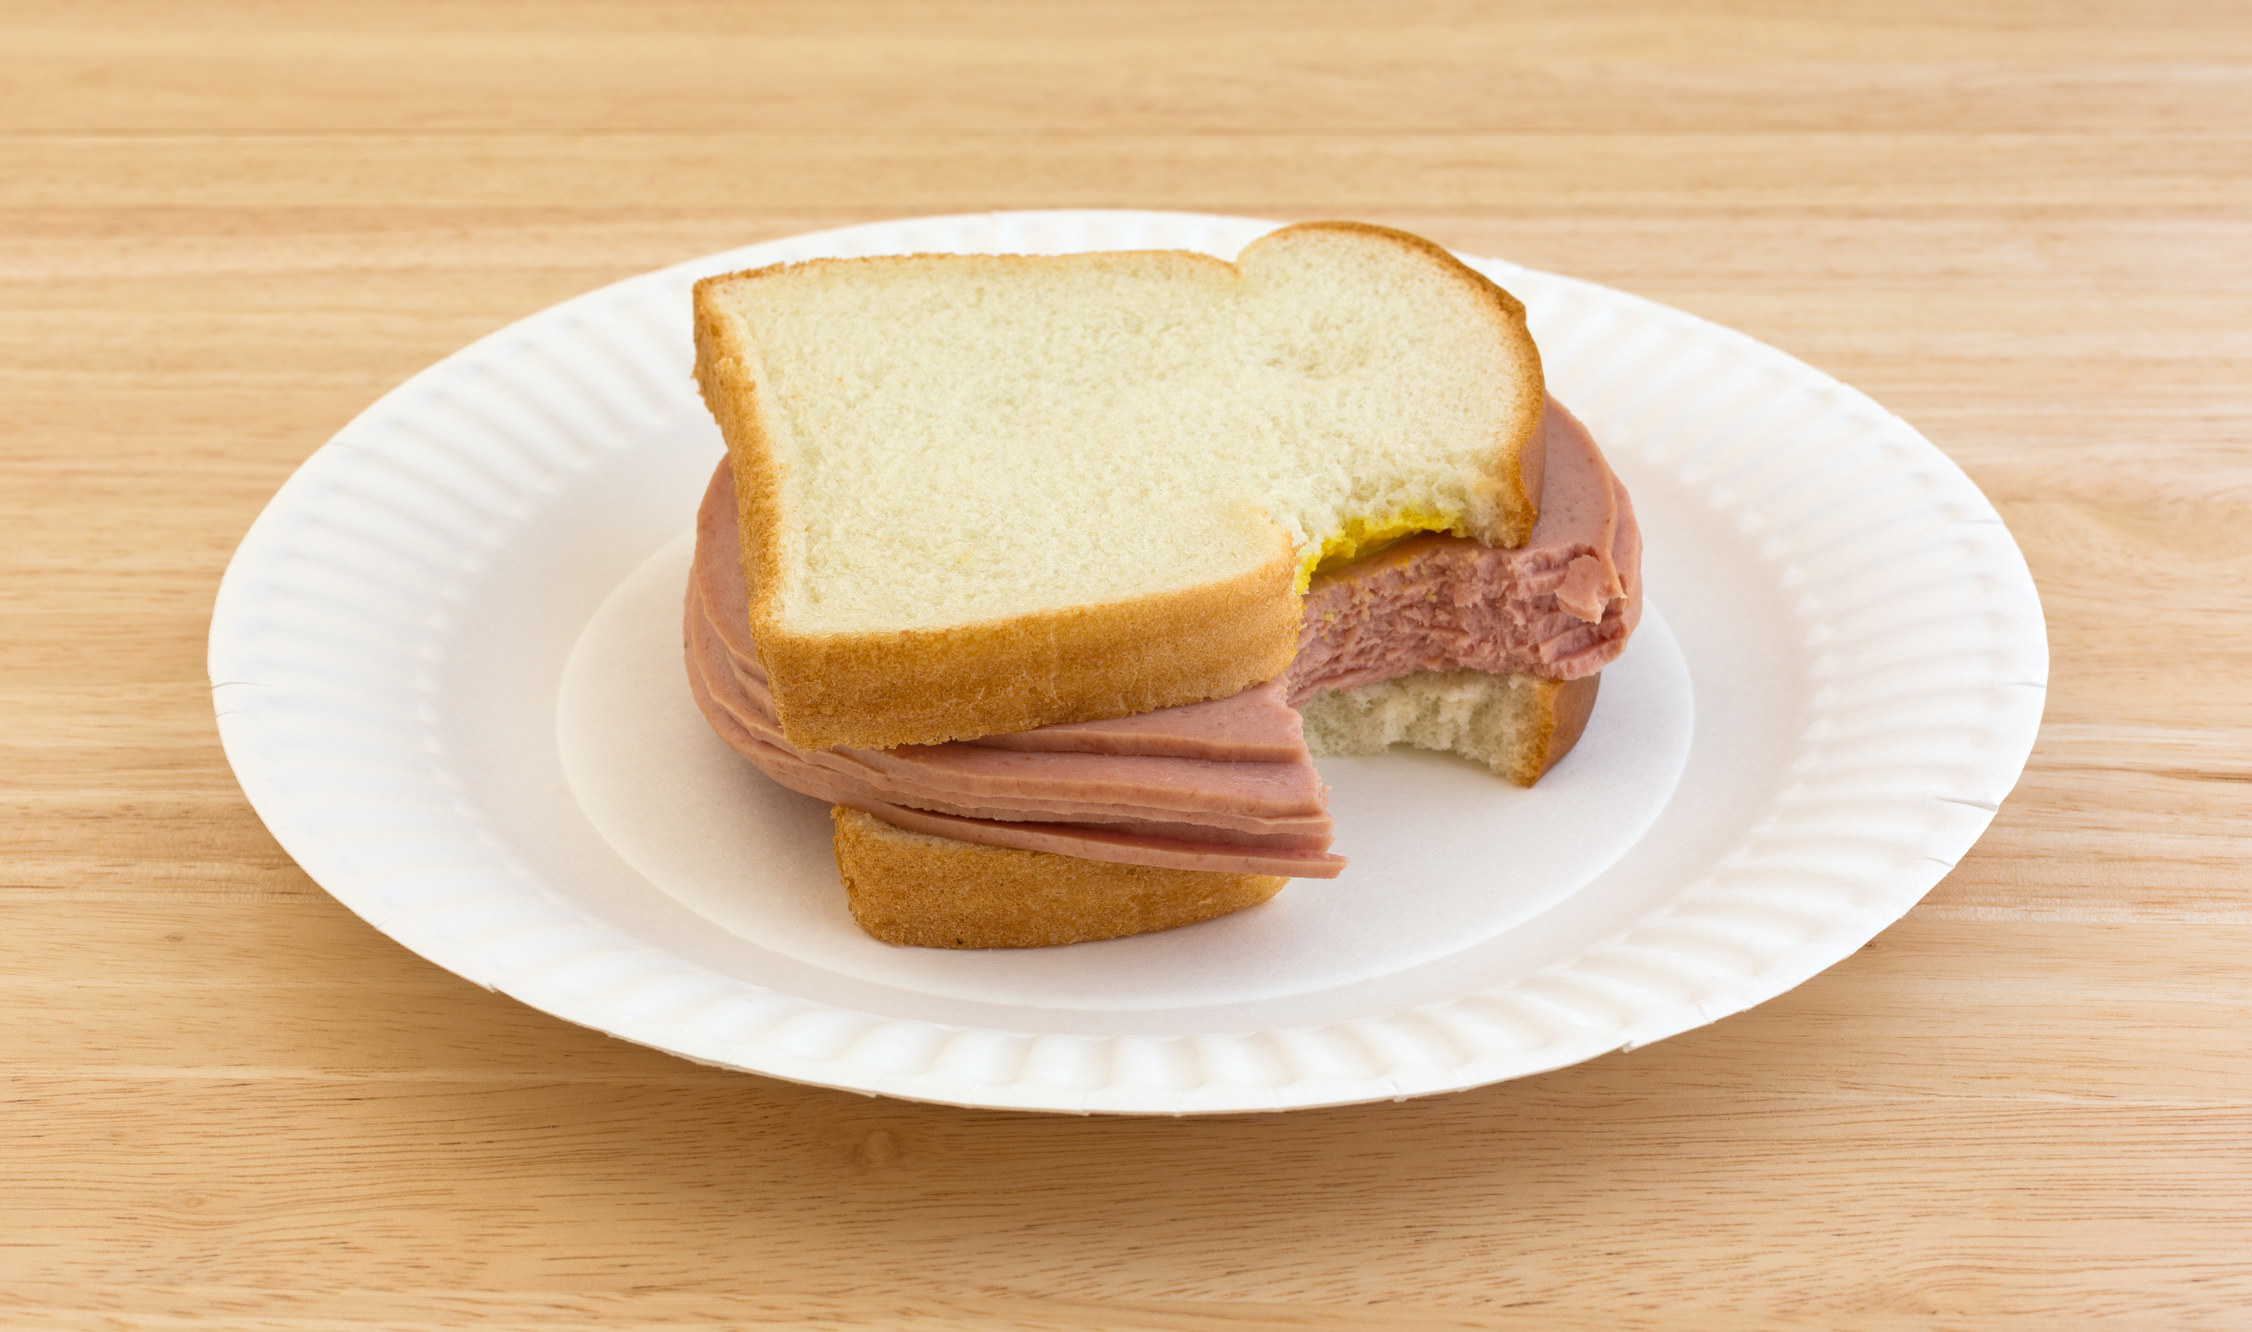 A bologna sandwich on a paper plate